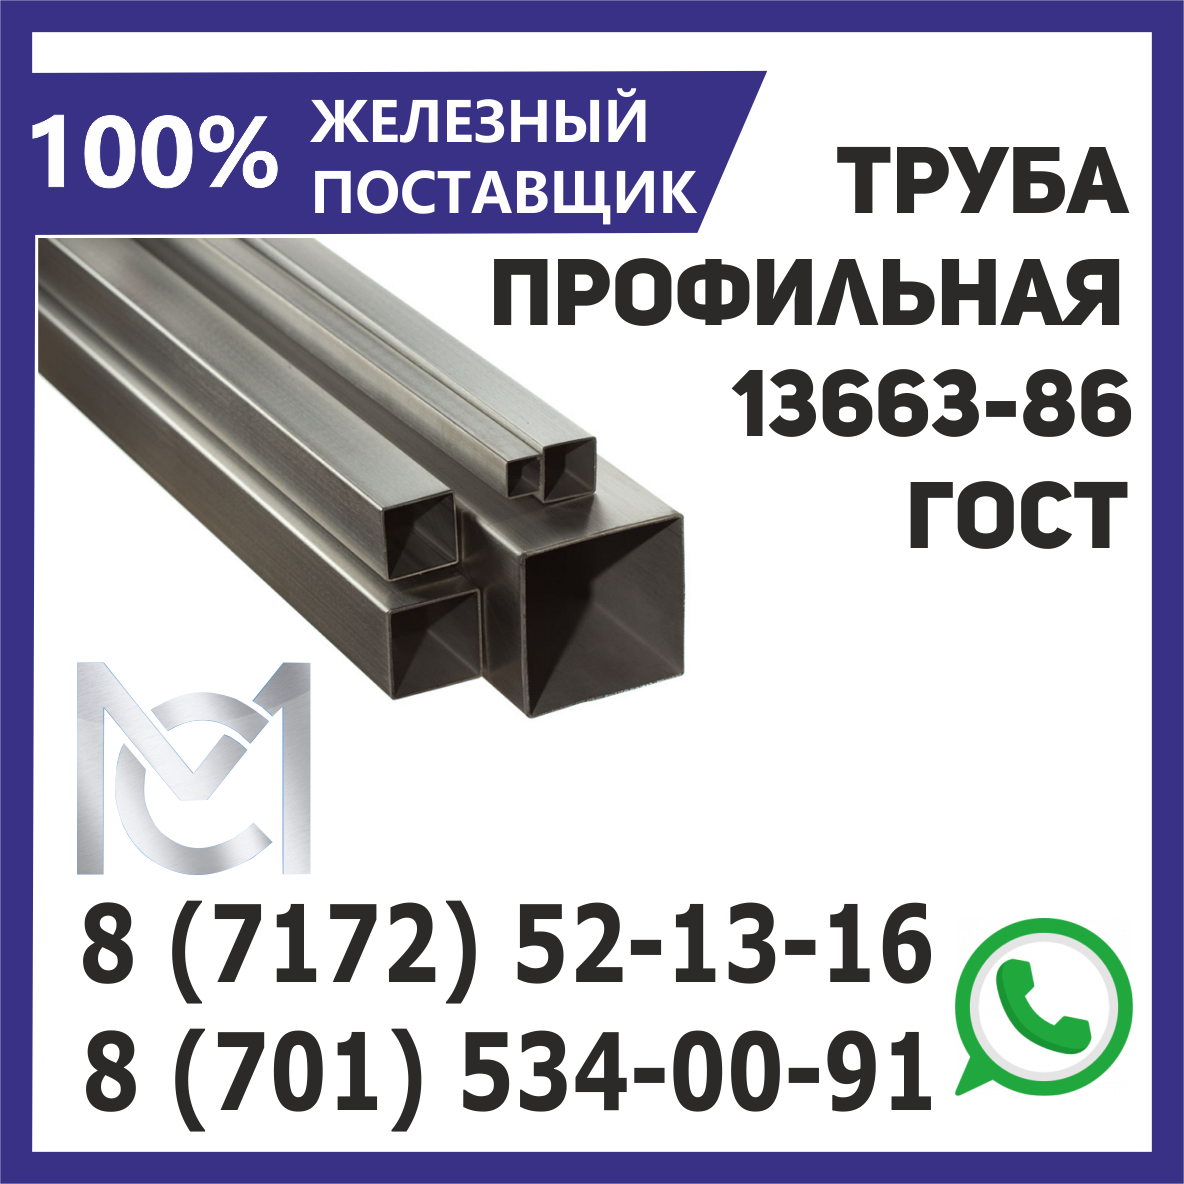 Труба профильная Д 25х25 1,5мм ГОСТ 13663-86 стальная 6 метров